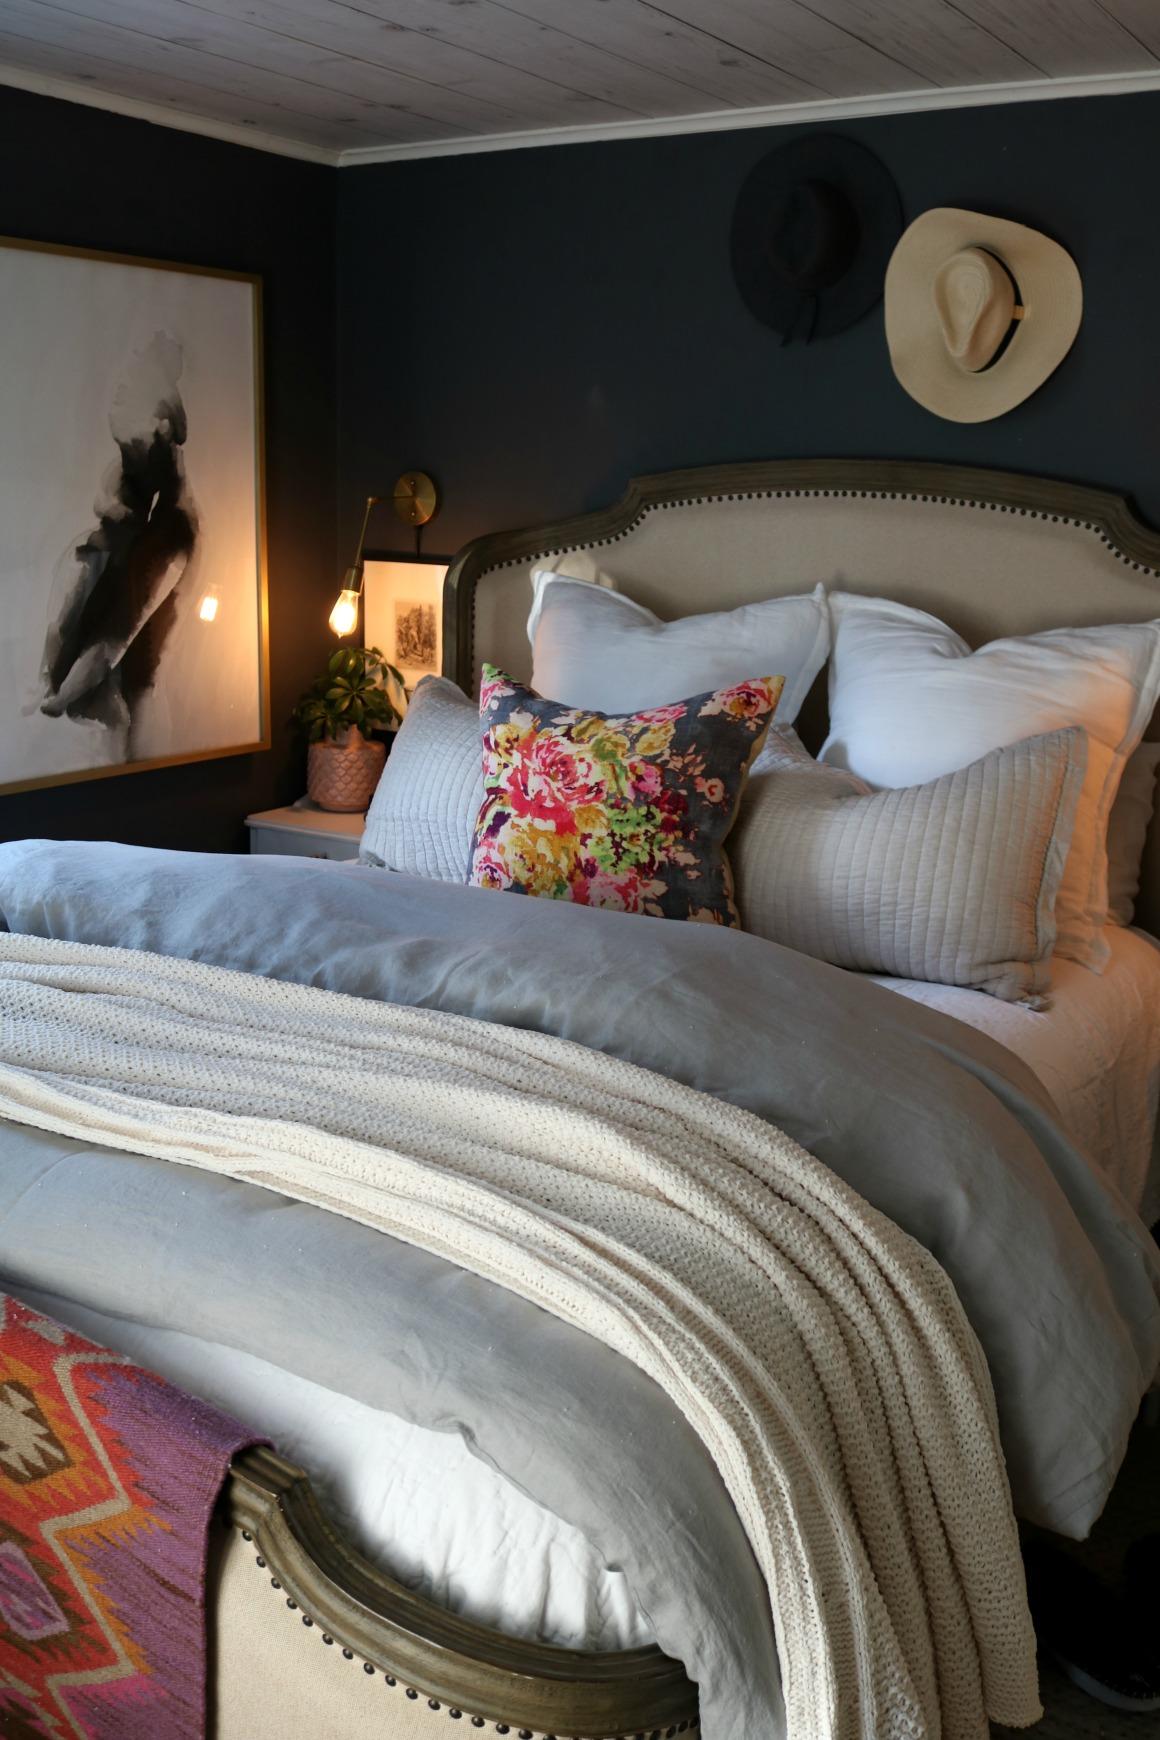 Splurge vs Budget Bedding- Bedding Two Ways